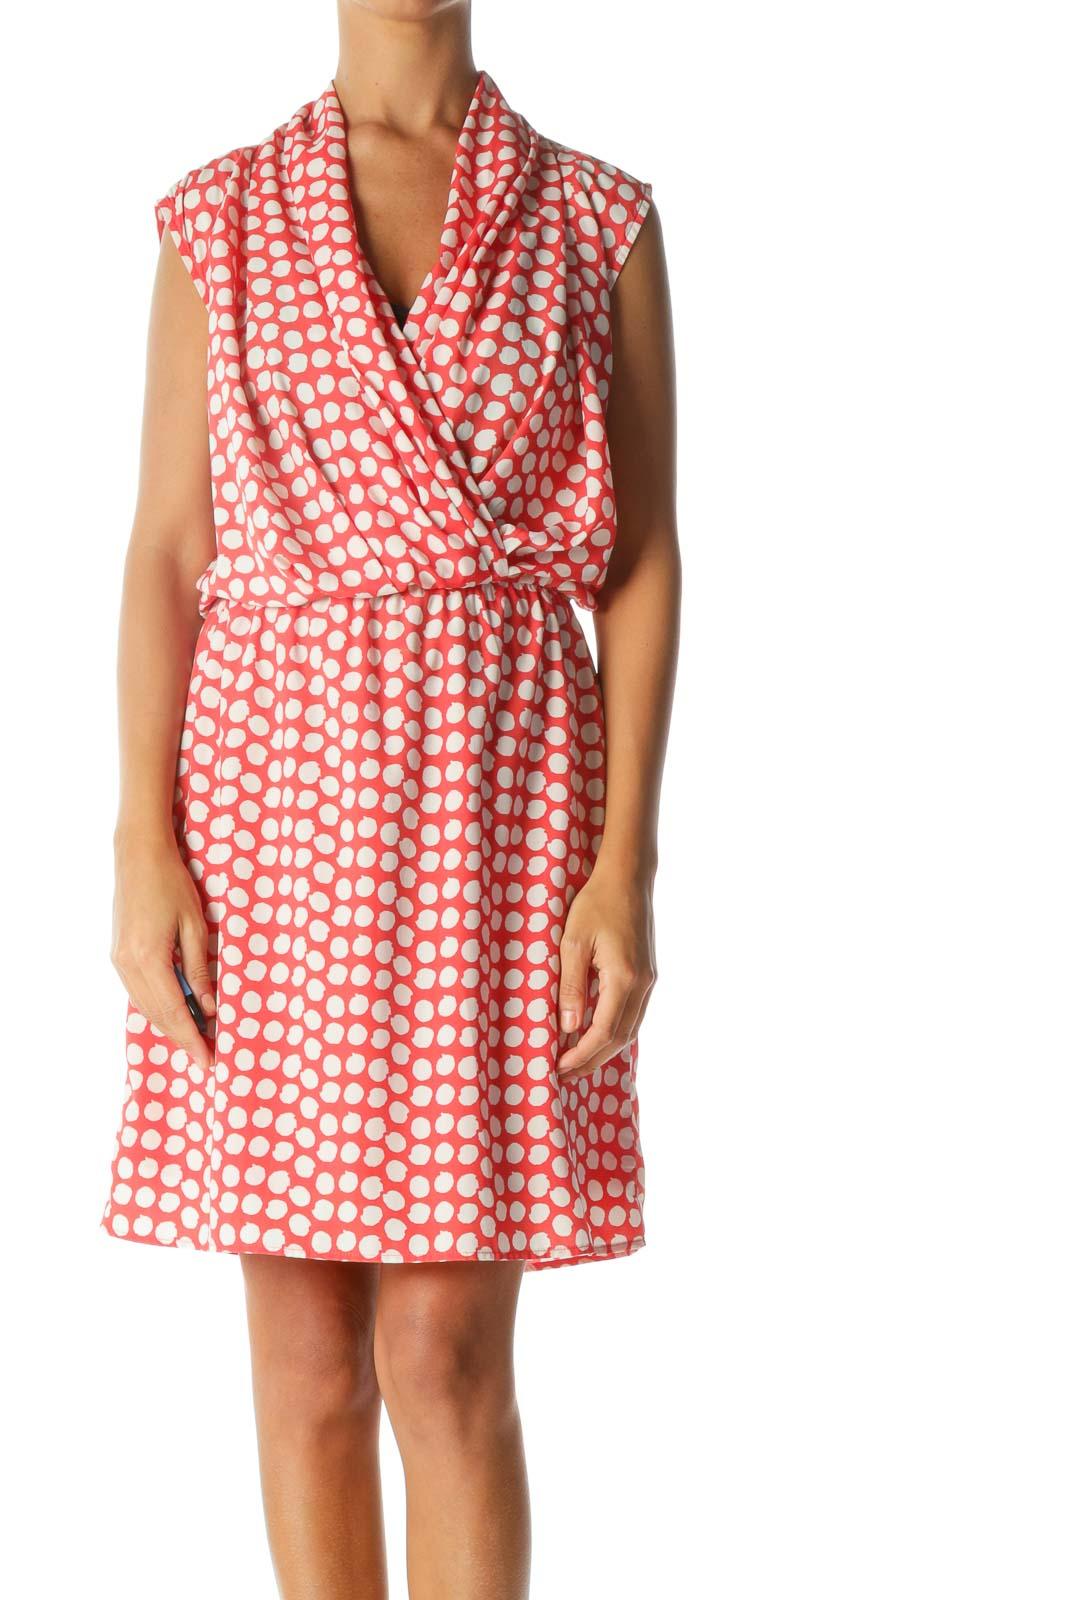 Red White Print Sleeveless Surplice Elastic Waist Day Dress Front